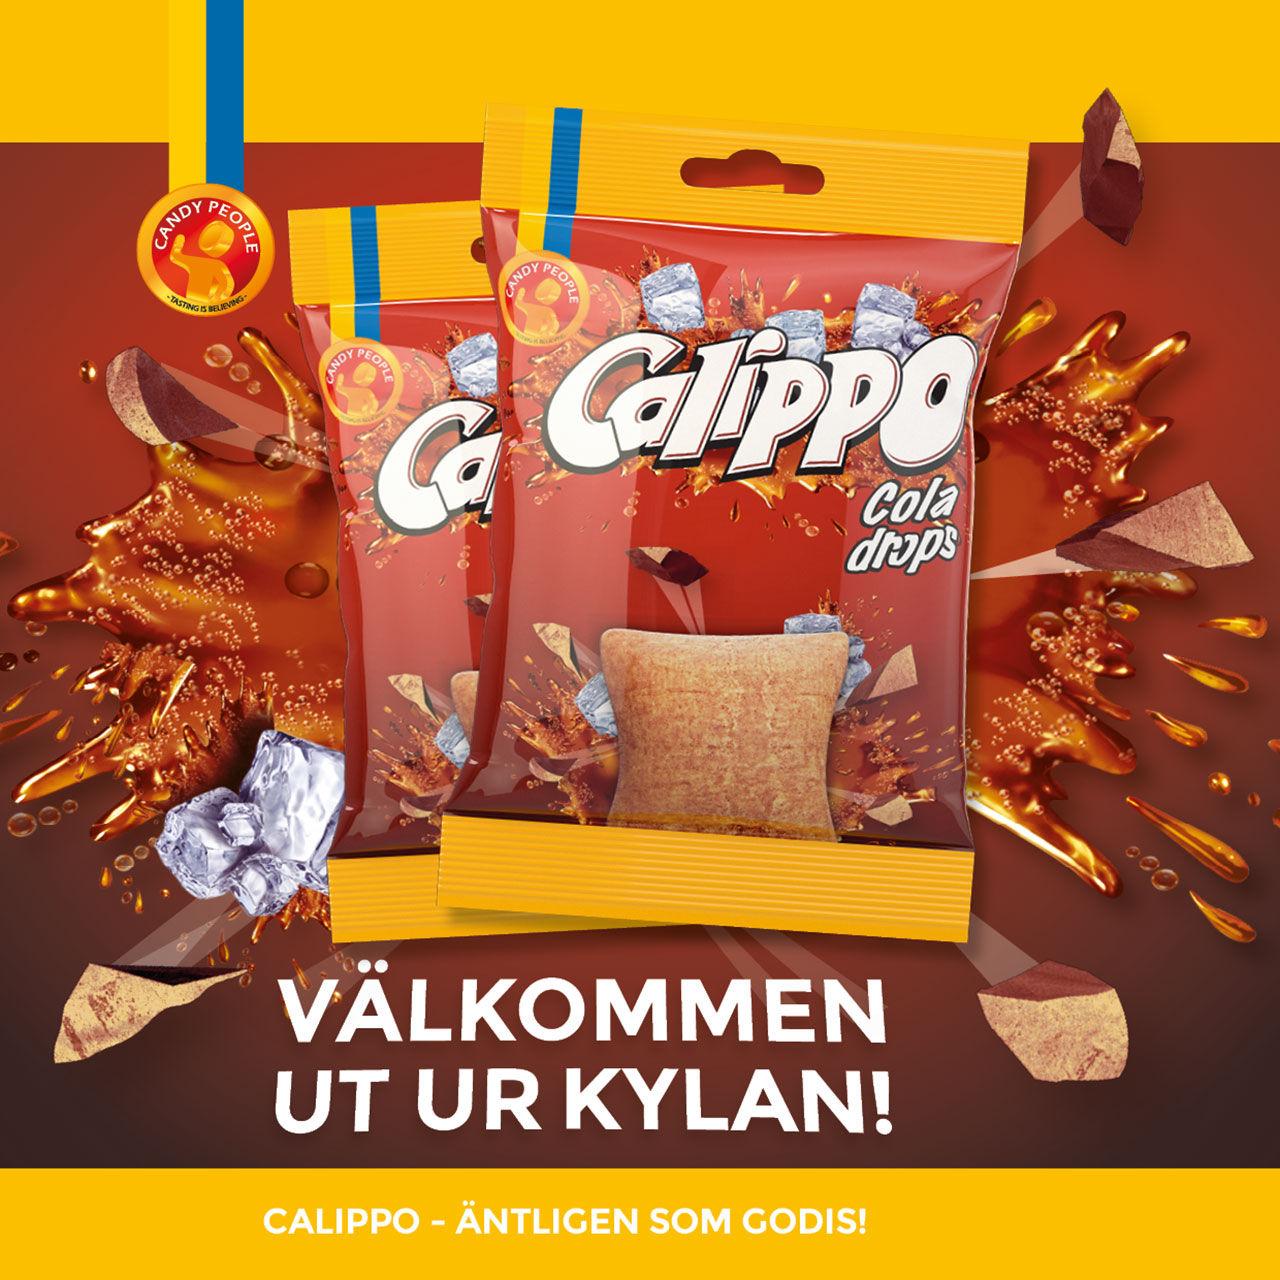 Glassen Calippo nu som karamell